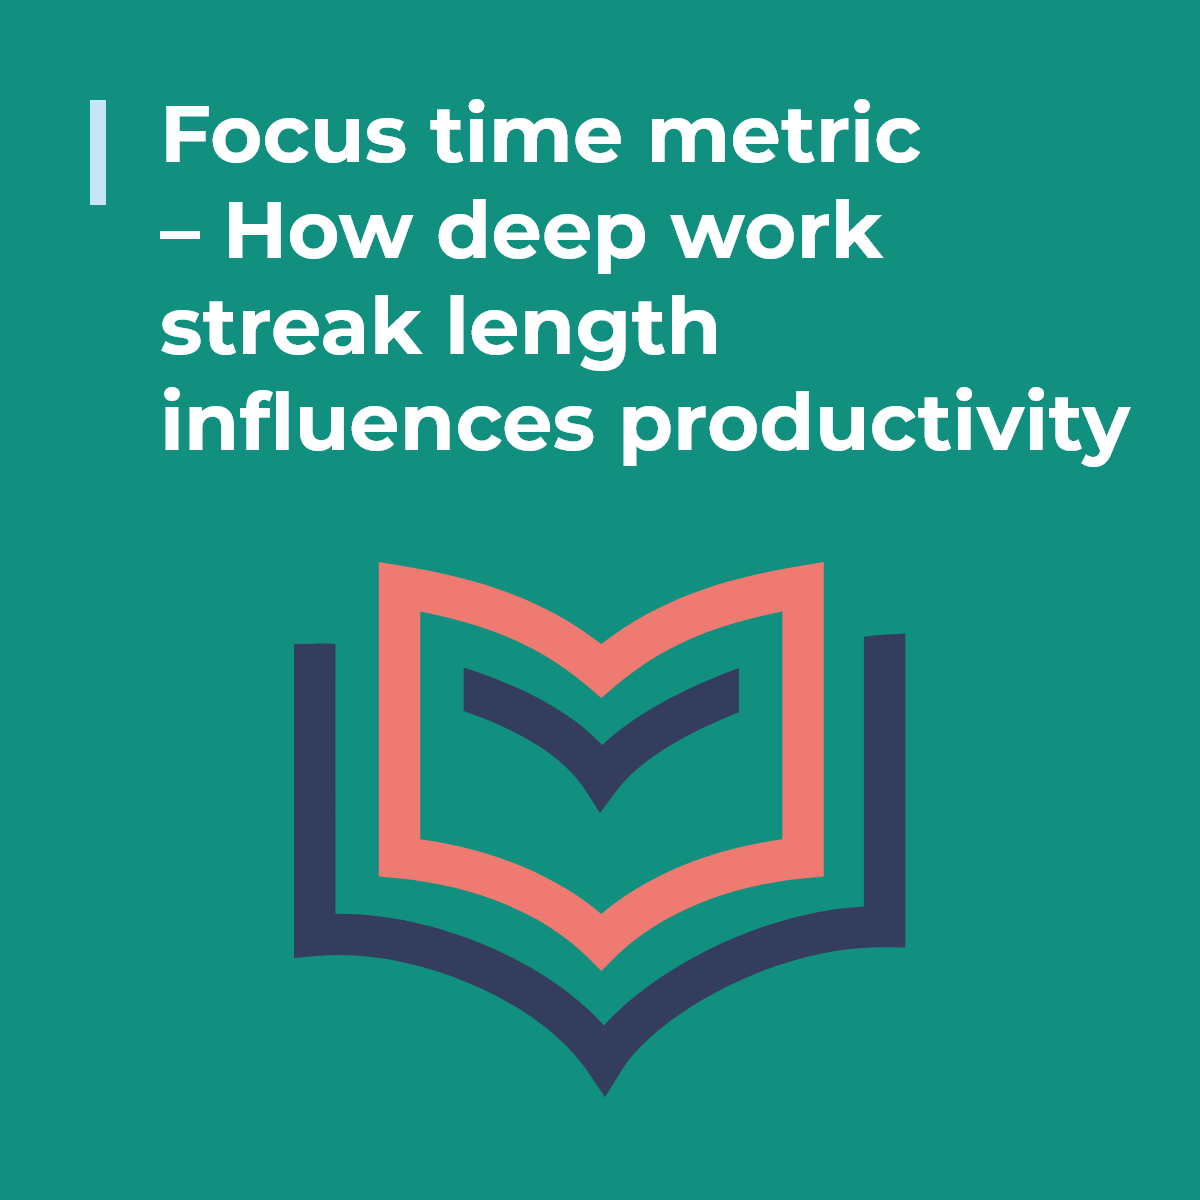 Focus time metric – How deep work streak length influences productivity